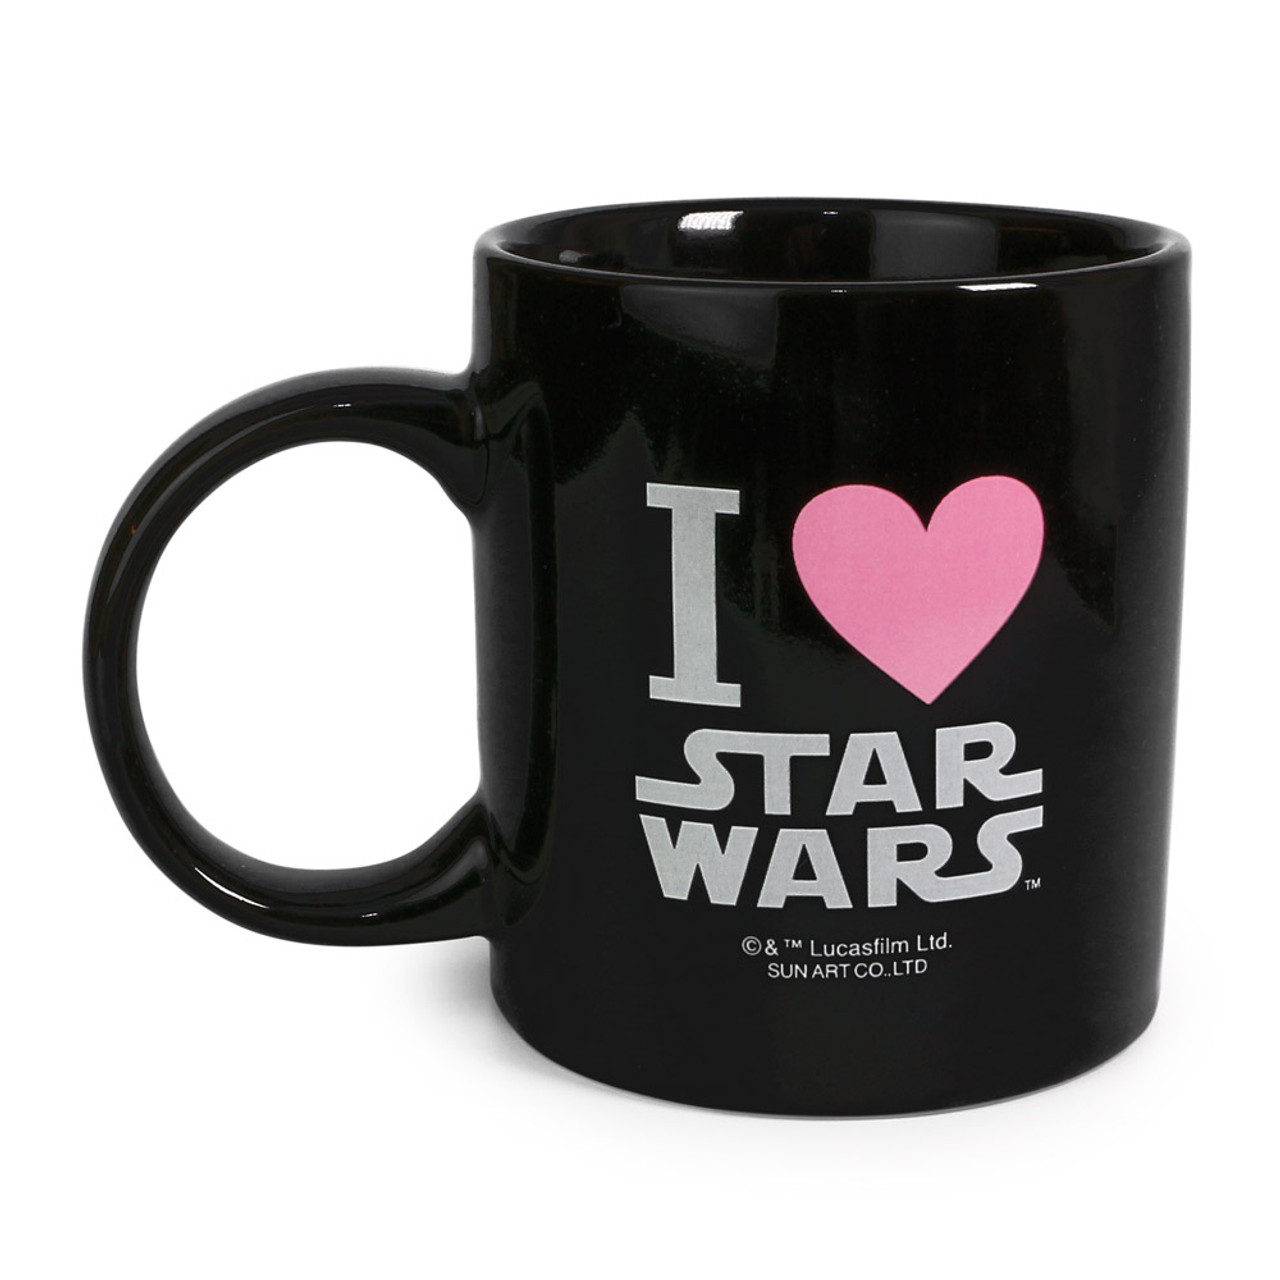 Star Wars Stormtrooper Typography Black Ceramic Mug ( Back View )